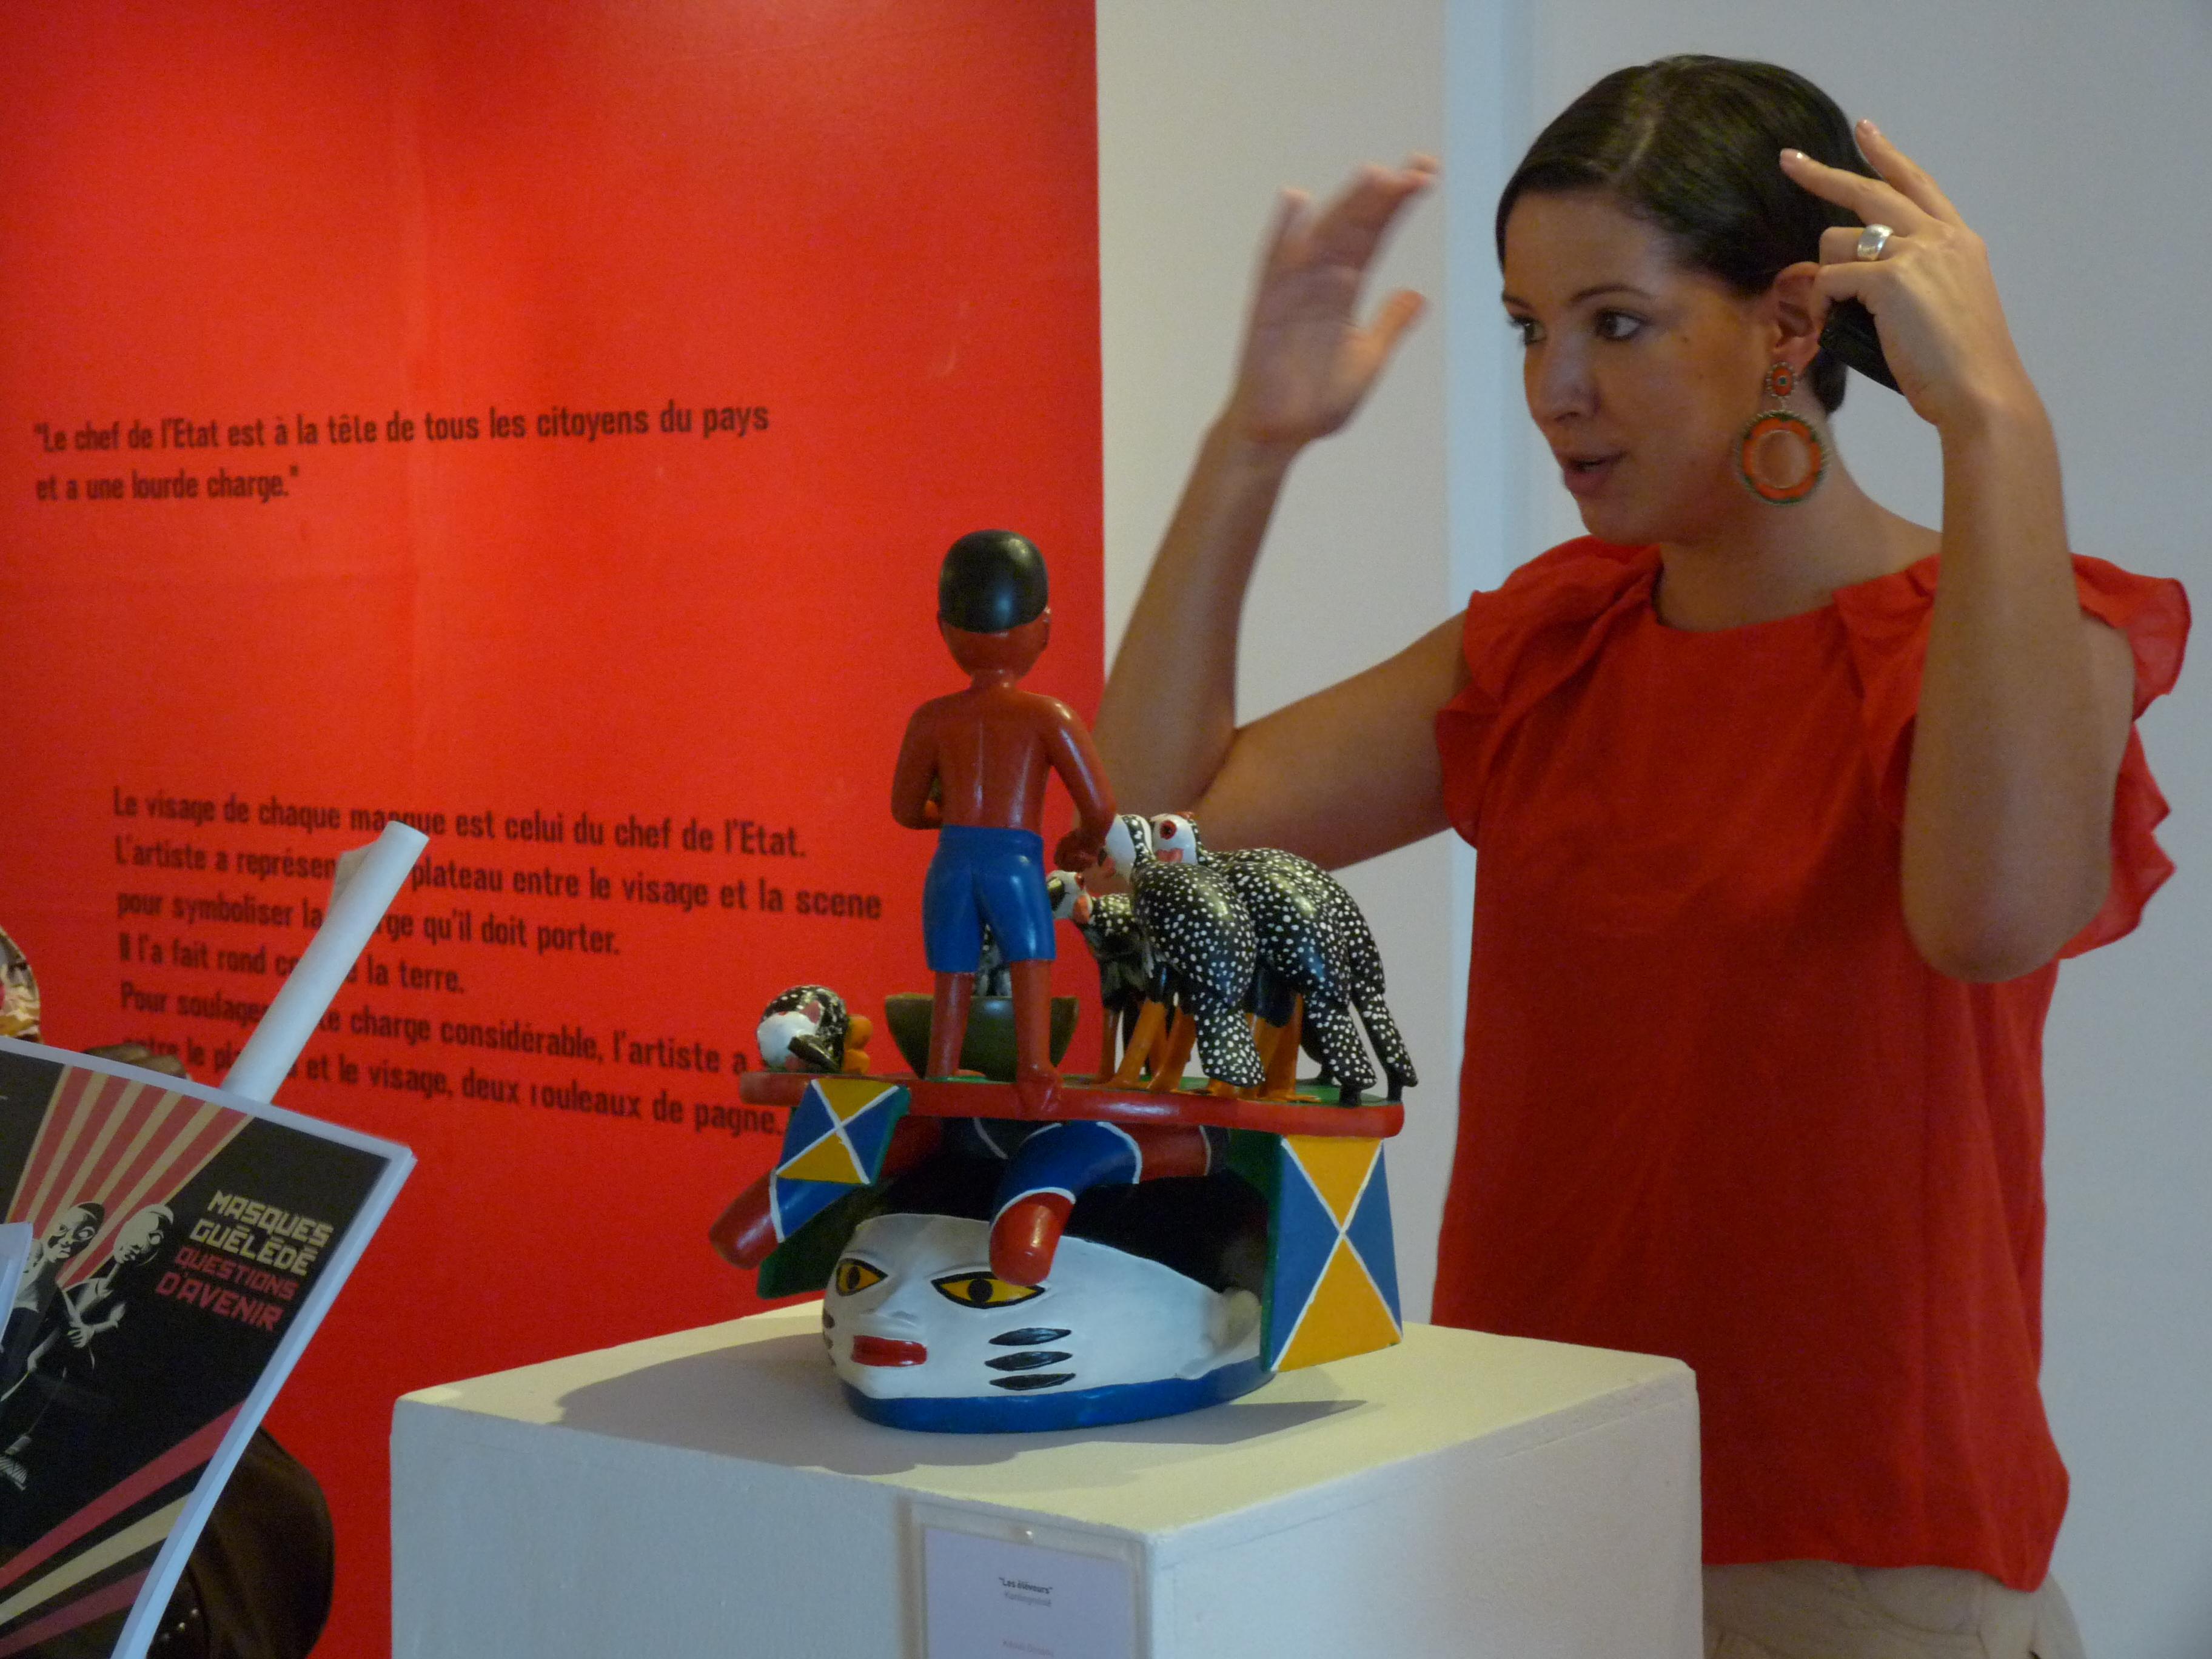 Exposition Le Sondage Fondation Zinsou à Cadjehoun Copyright: La Fondation Zinsou